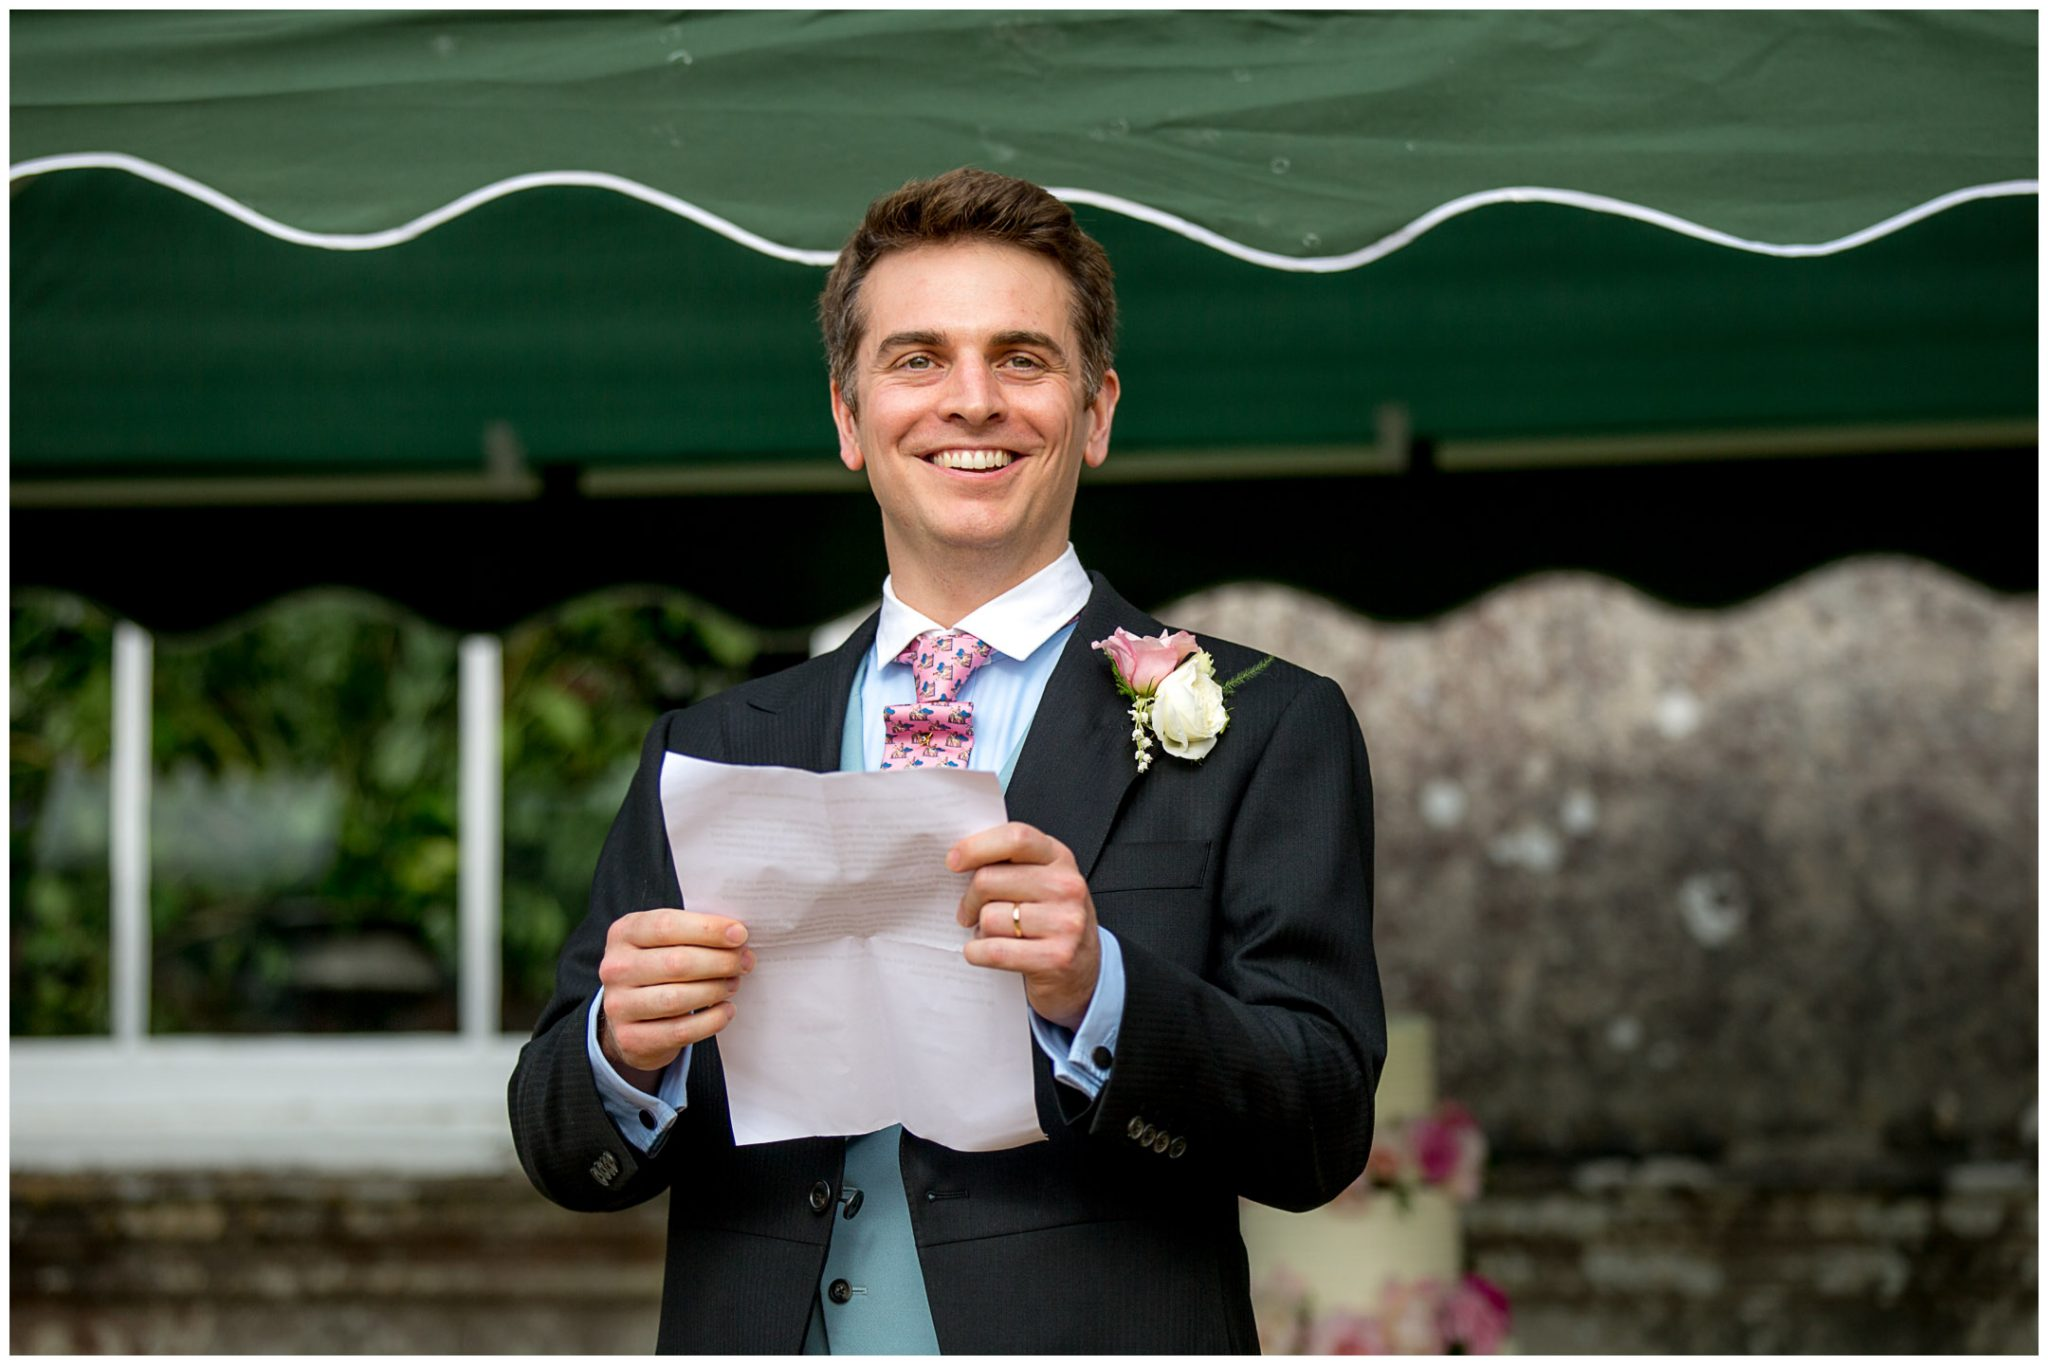 The groom makes his wedding speech